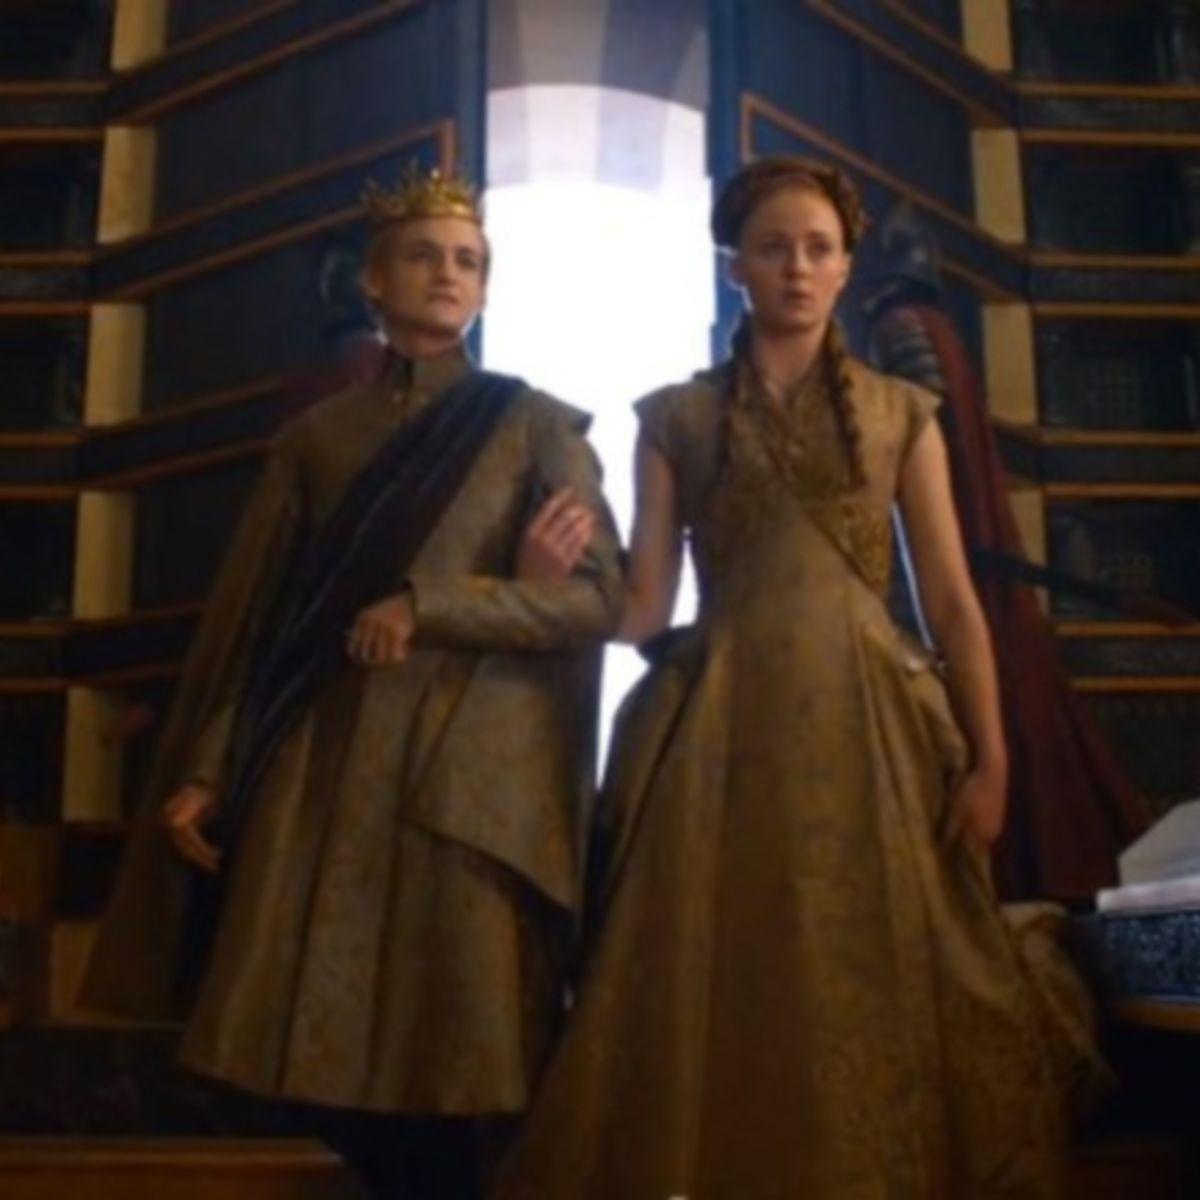 game-of-thrones-season-3-joffrey-and-sansa.jpg